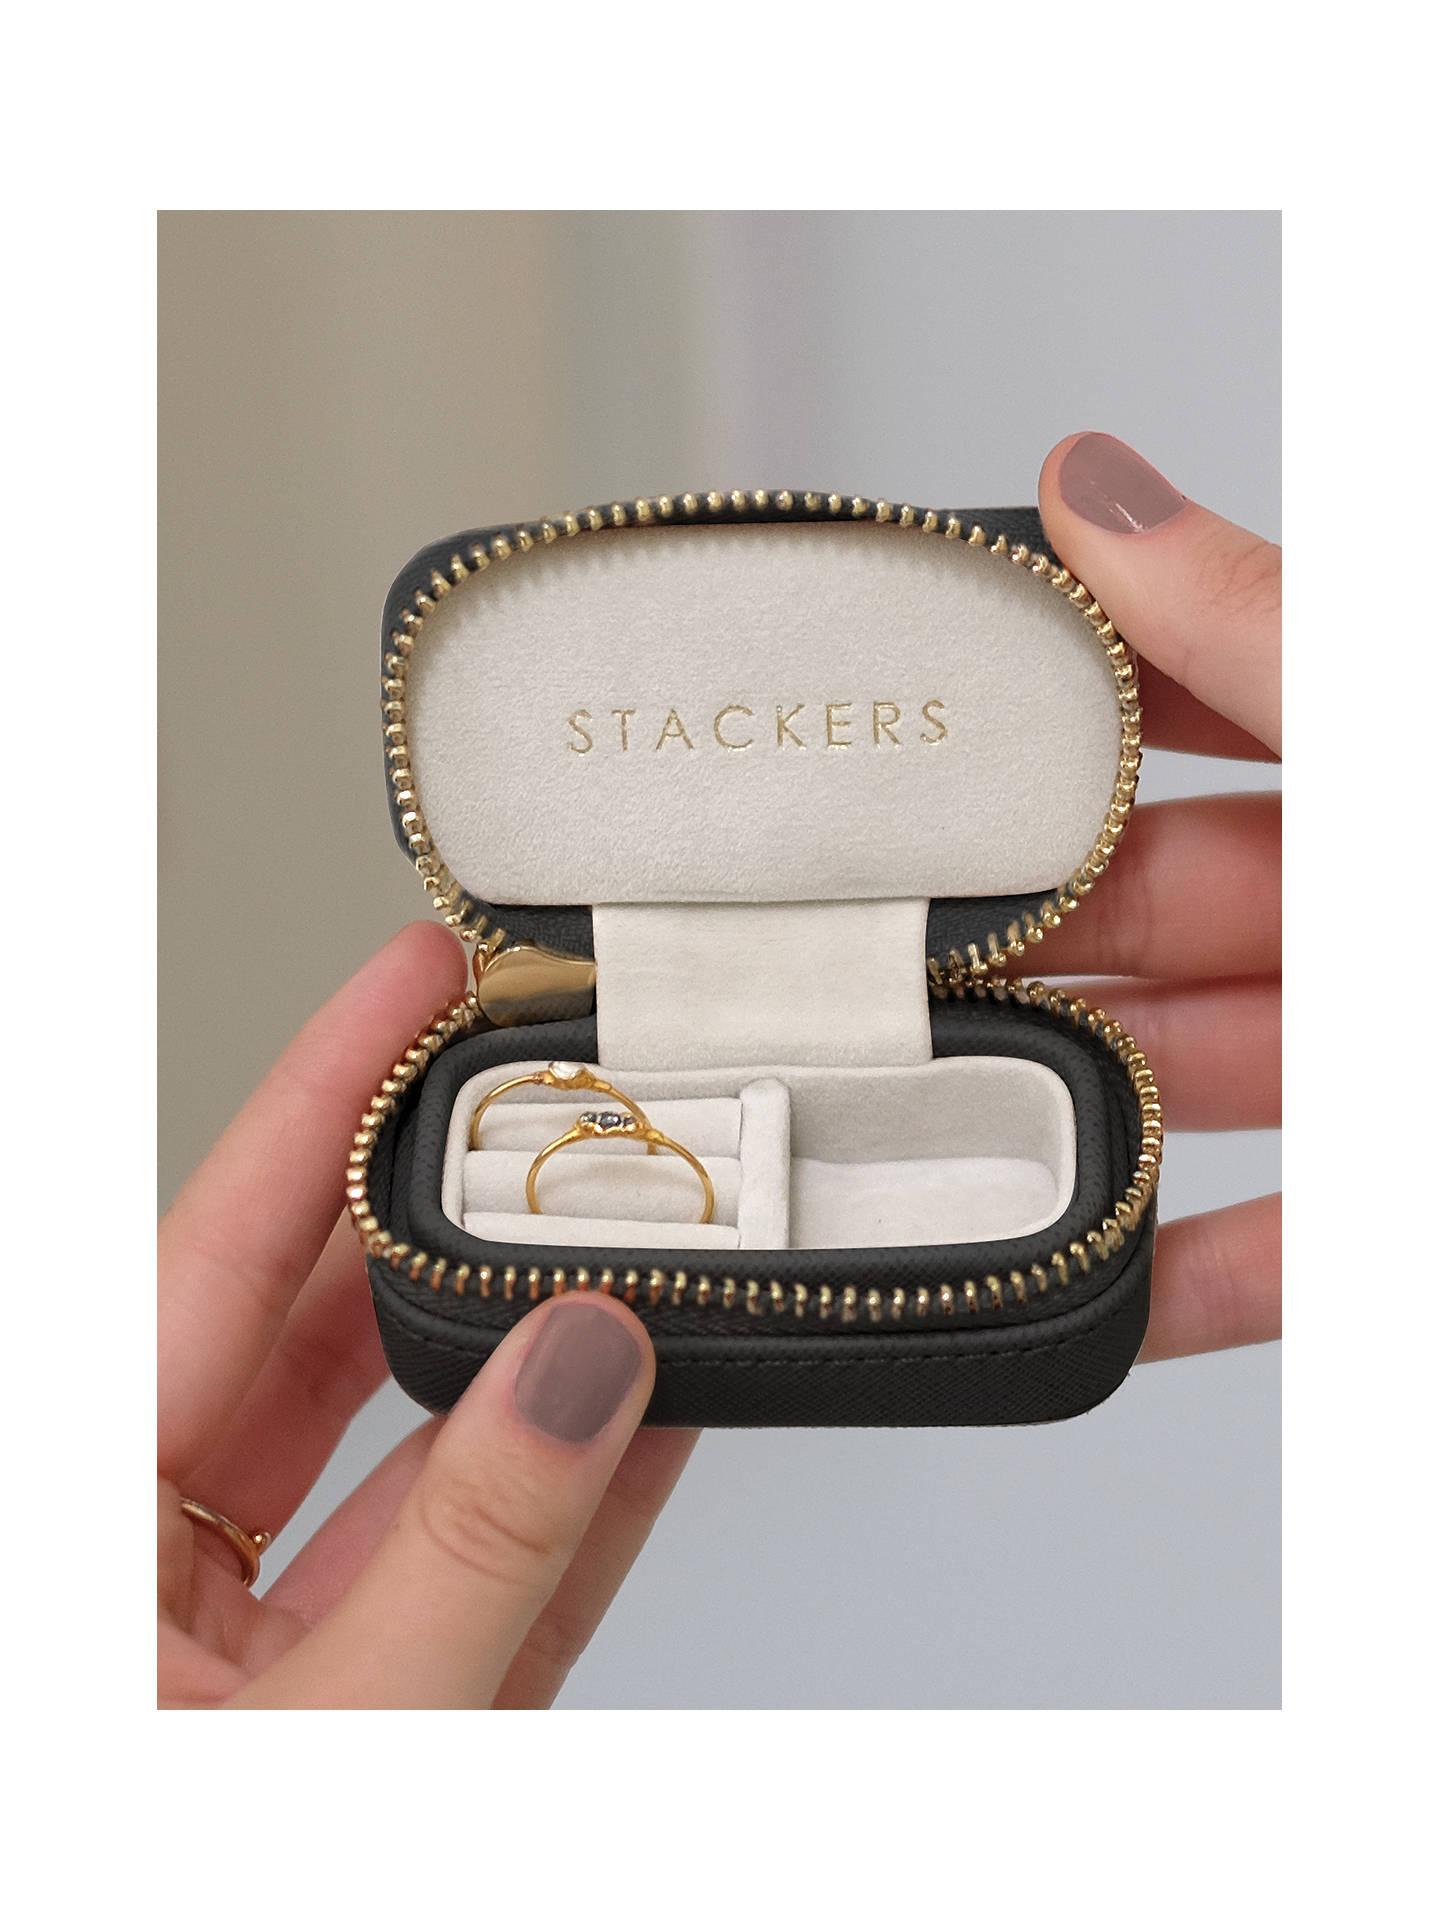 Stackers Petite Travel Jewellery Box Black